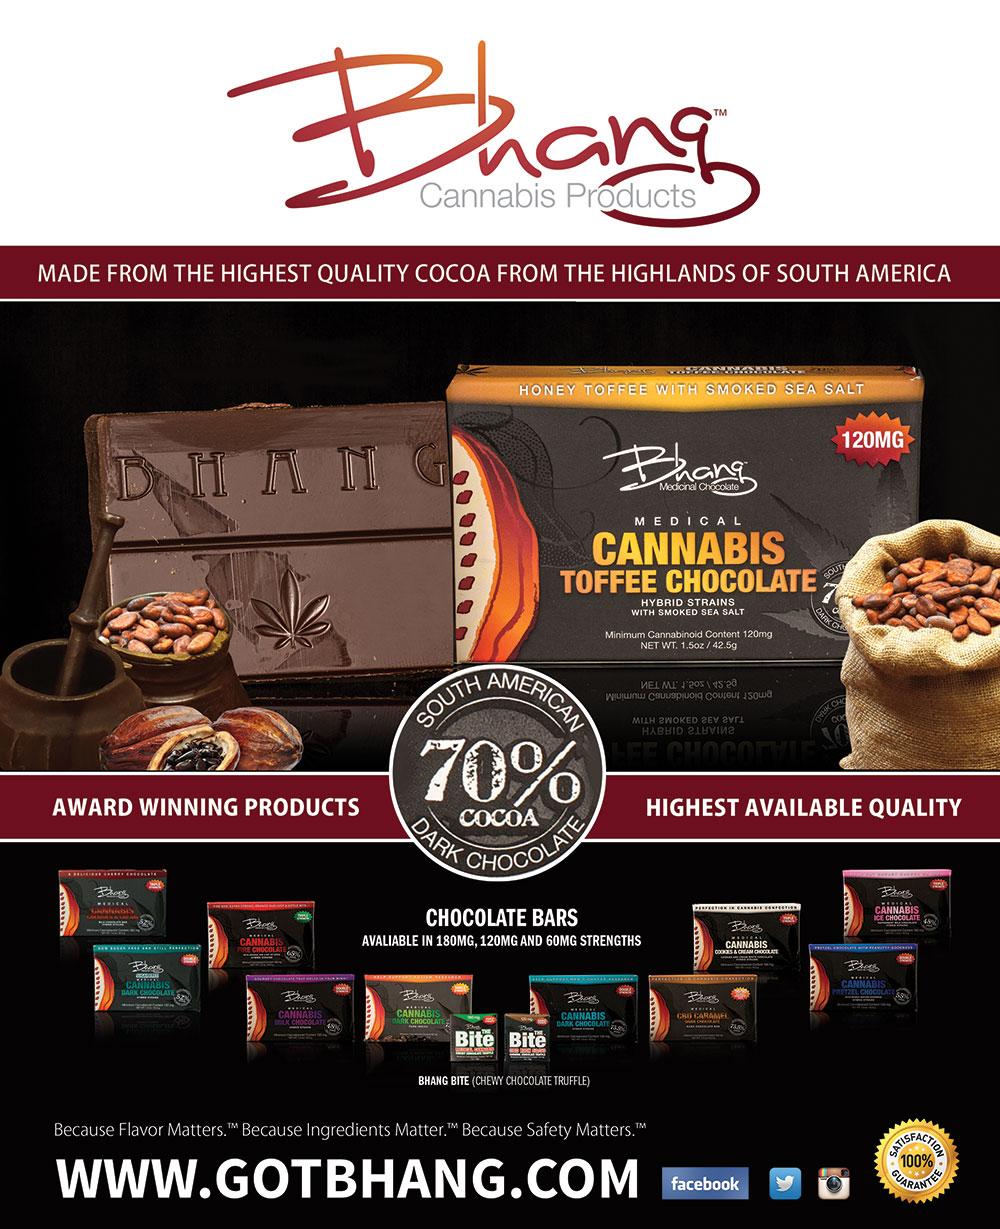 Bhang Chocolate – MontyVision Creative Studios